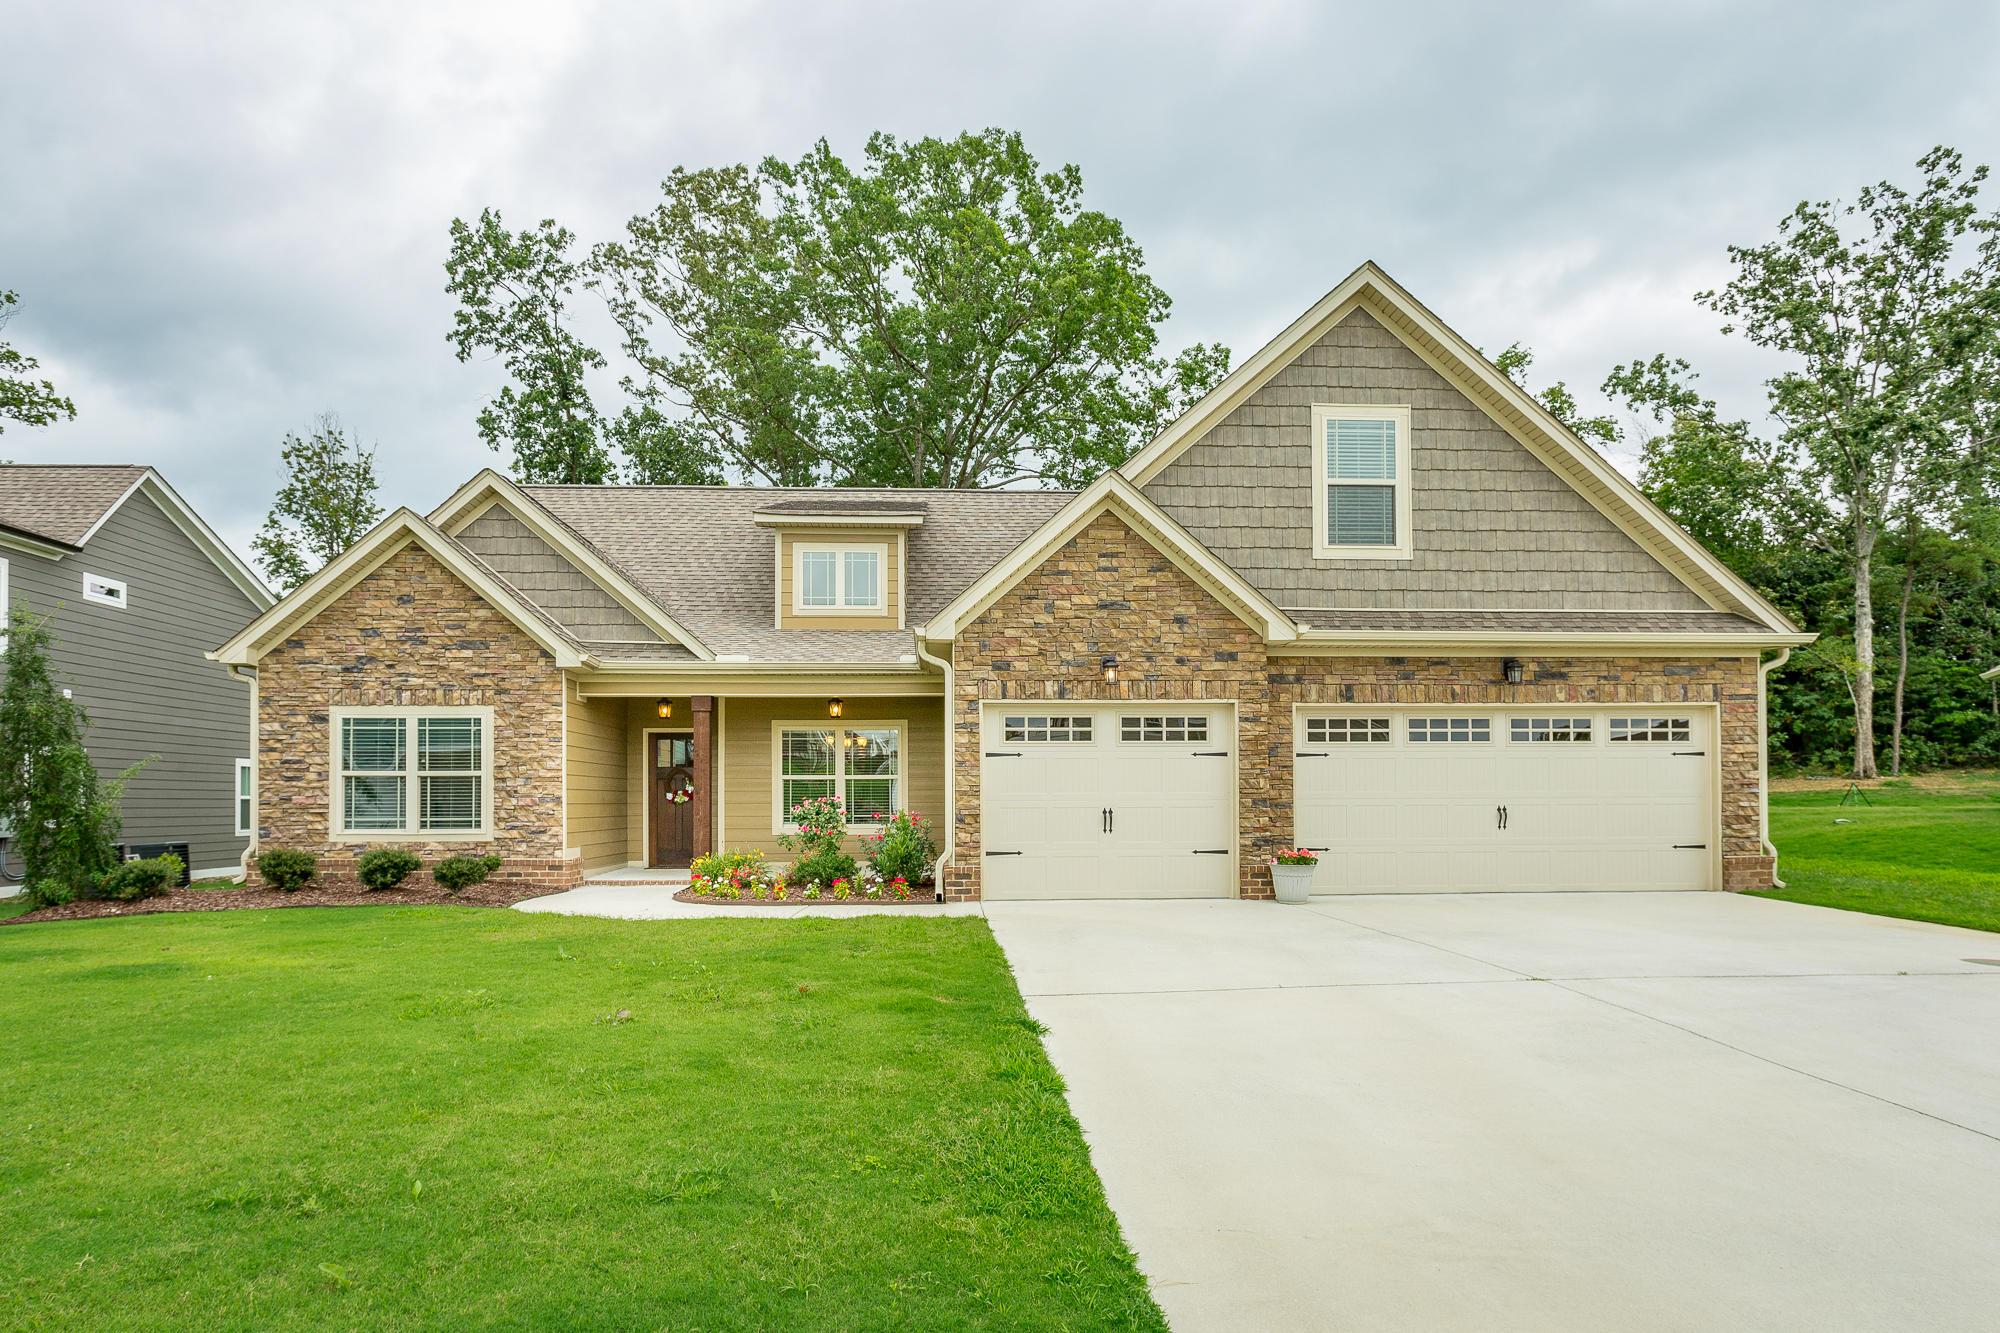 441 Live Oak Rd, Ringgold, GA 30736